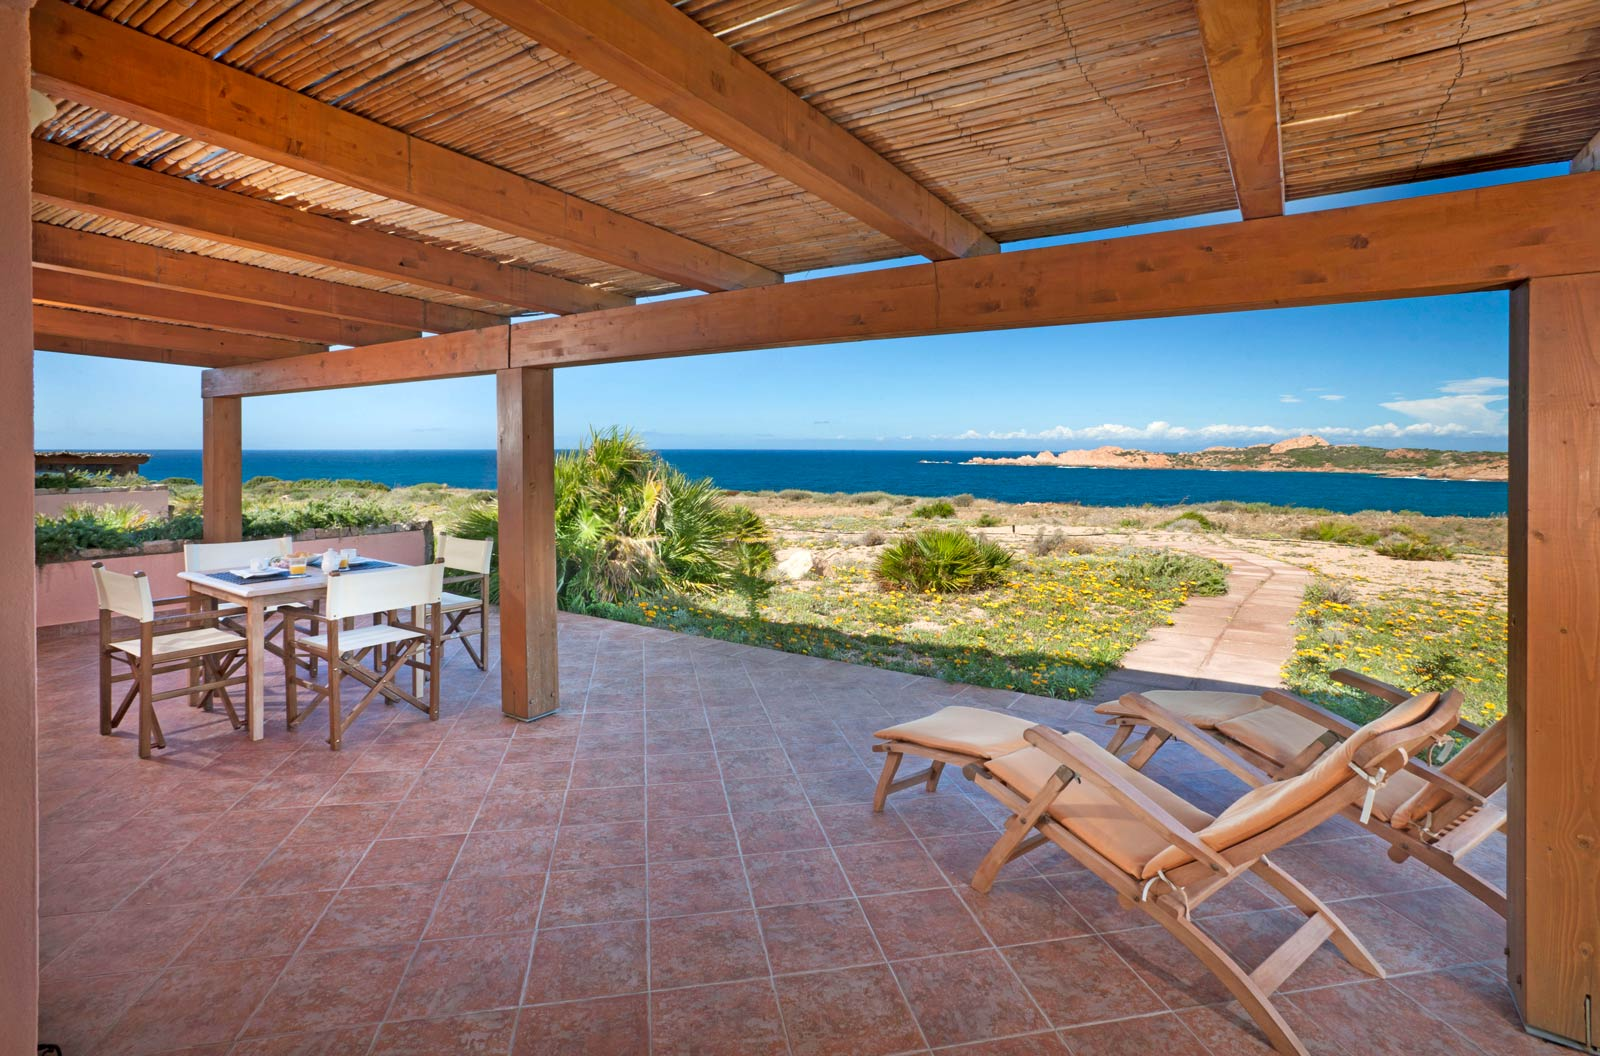 Master suite Veranda at Hotel Relax Torreruja Thalasso & Spa